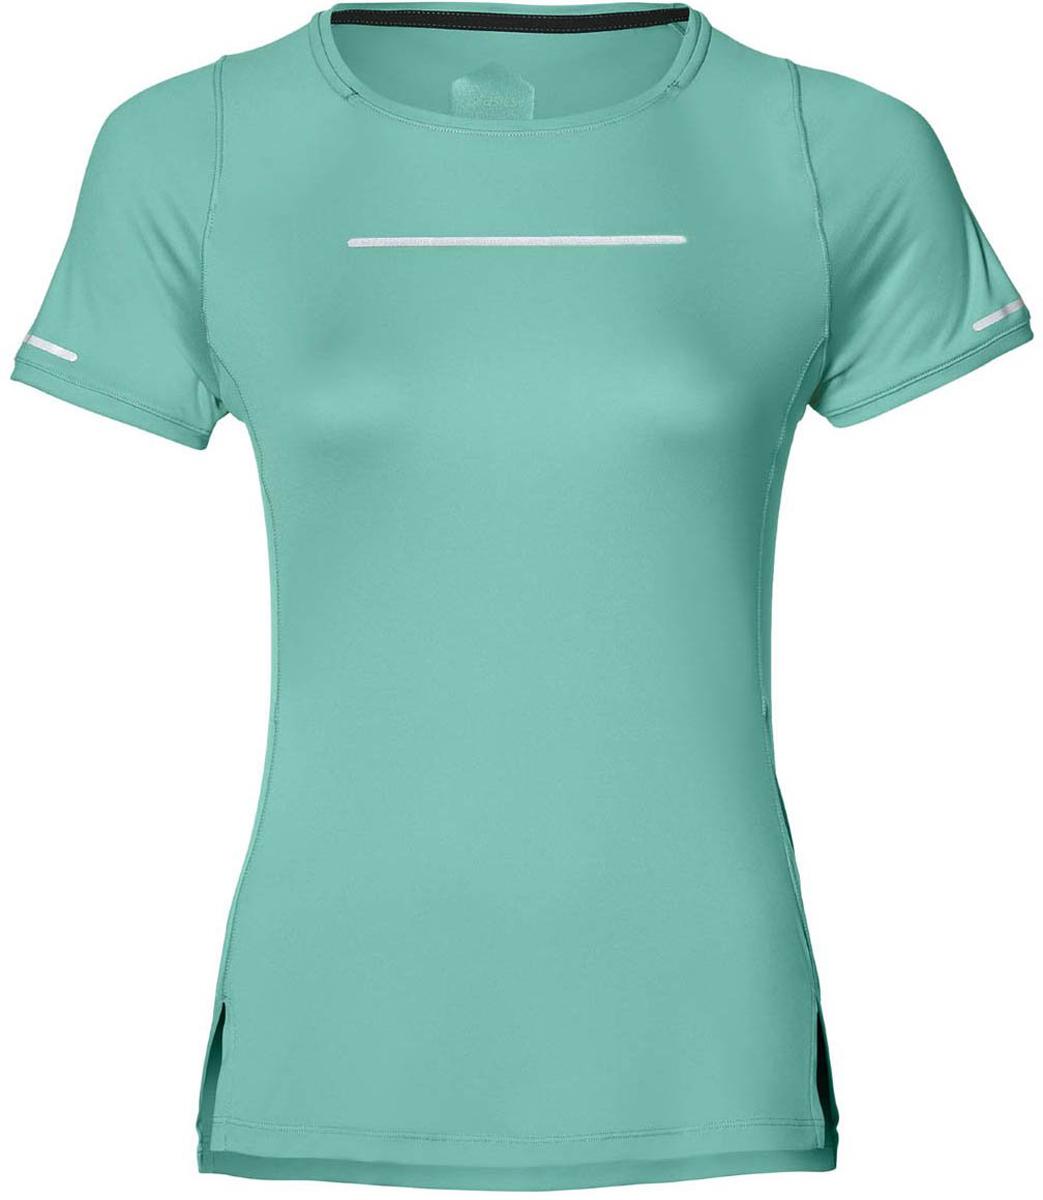 Футболка женская Asics Lite-Show Ss Top, цвет: бирюзовый. 154528-0498. Размер M (46)154528-0498